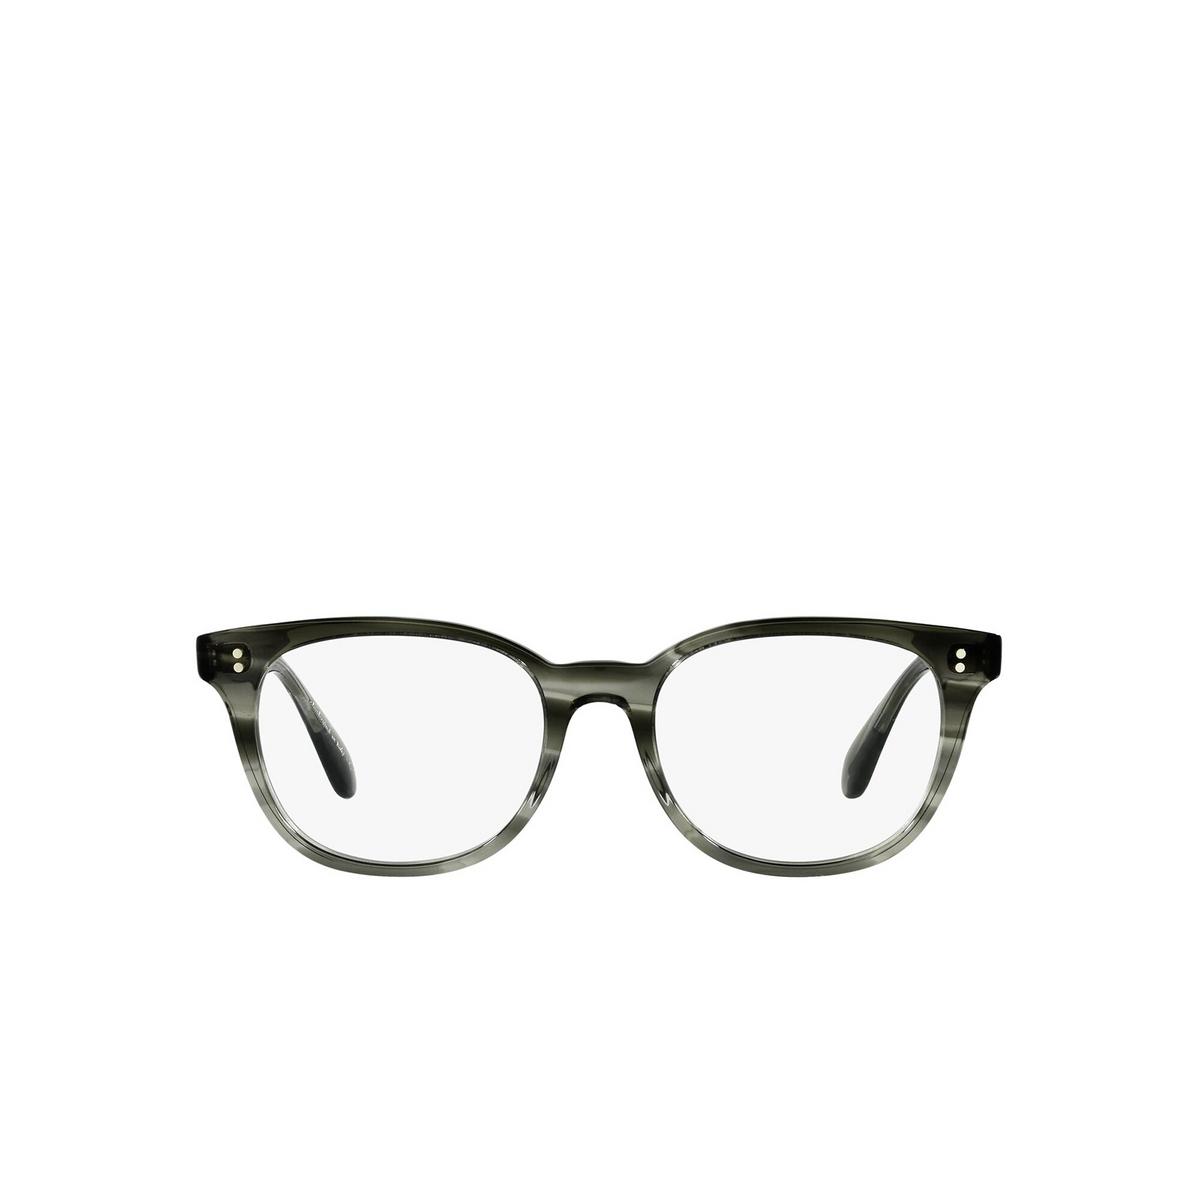 Oliver Peoples® Cat-eye Eyeglasses: Hildie OV5457U color Washed Jade 1705 - front view.